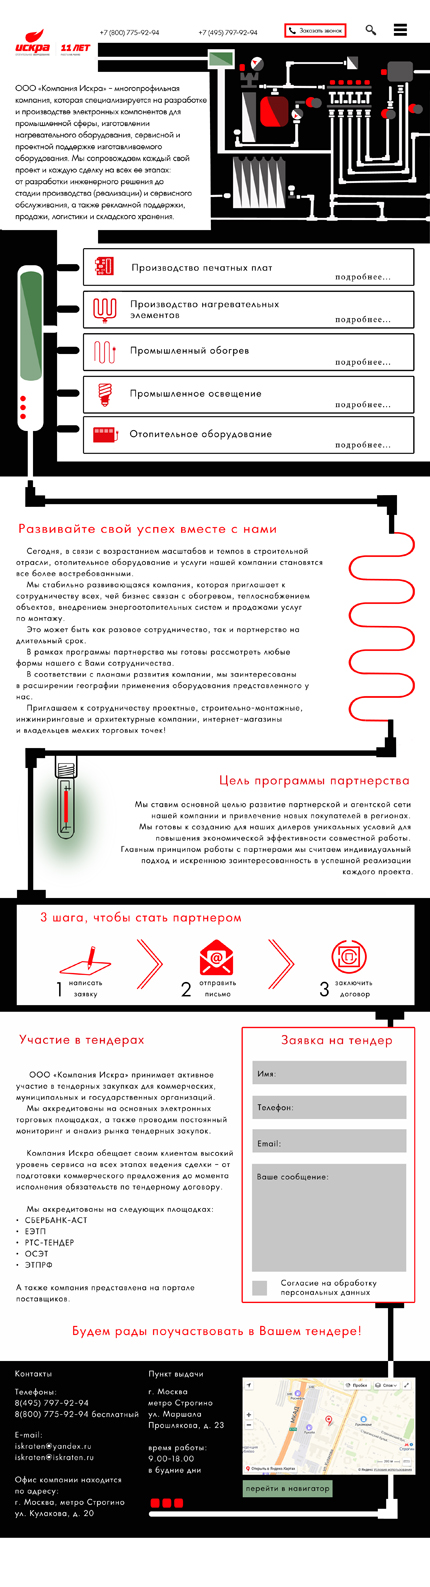 Дизайн сайта-визитки компании фото f_6005d2501cd0155f.jpg